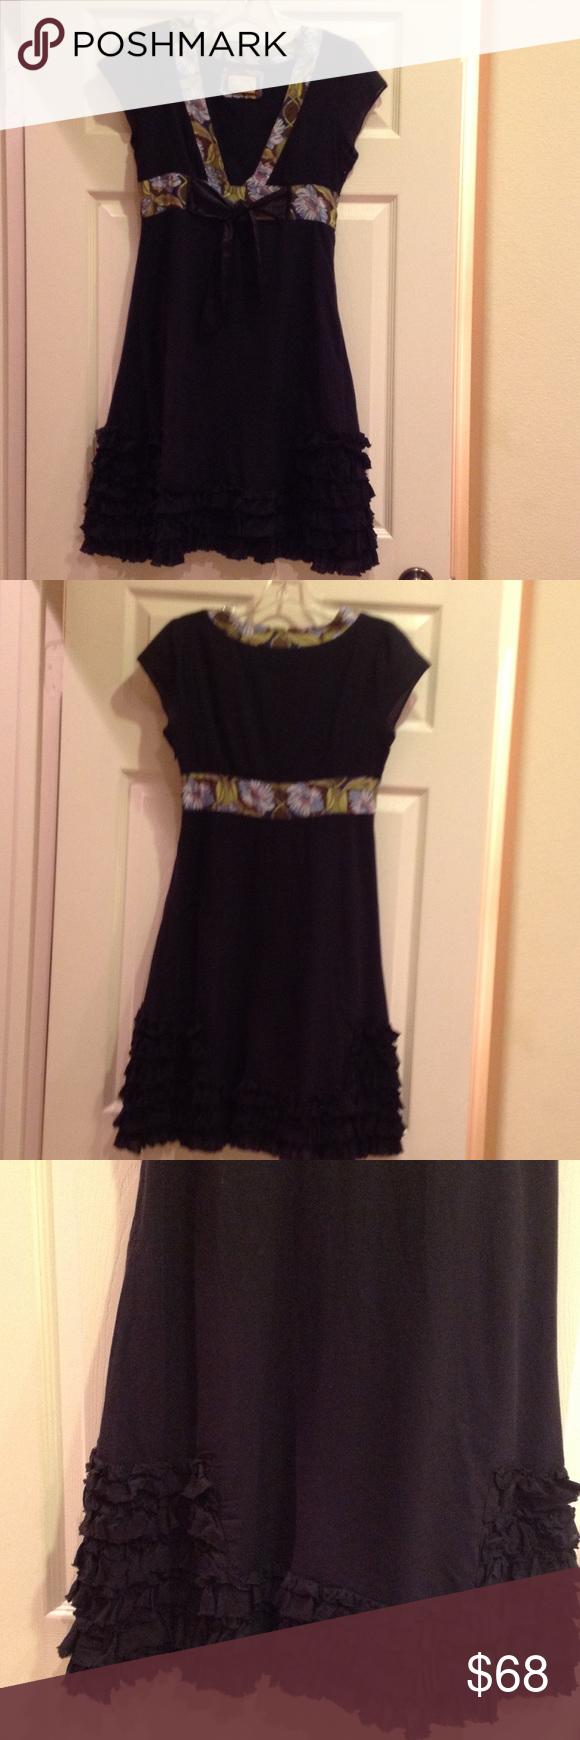 Free People Black Ruffled Cotton Dress Size 4 Free People Black Dress Clothes Design Cotton Dresses [ 1740 x 580 Pixel ]